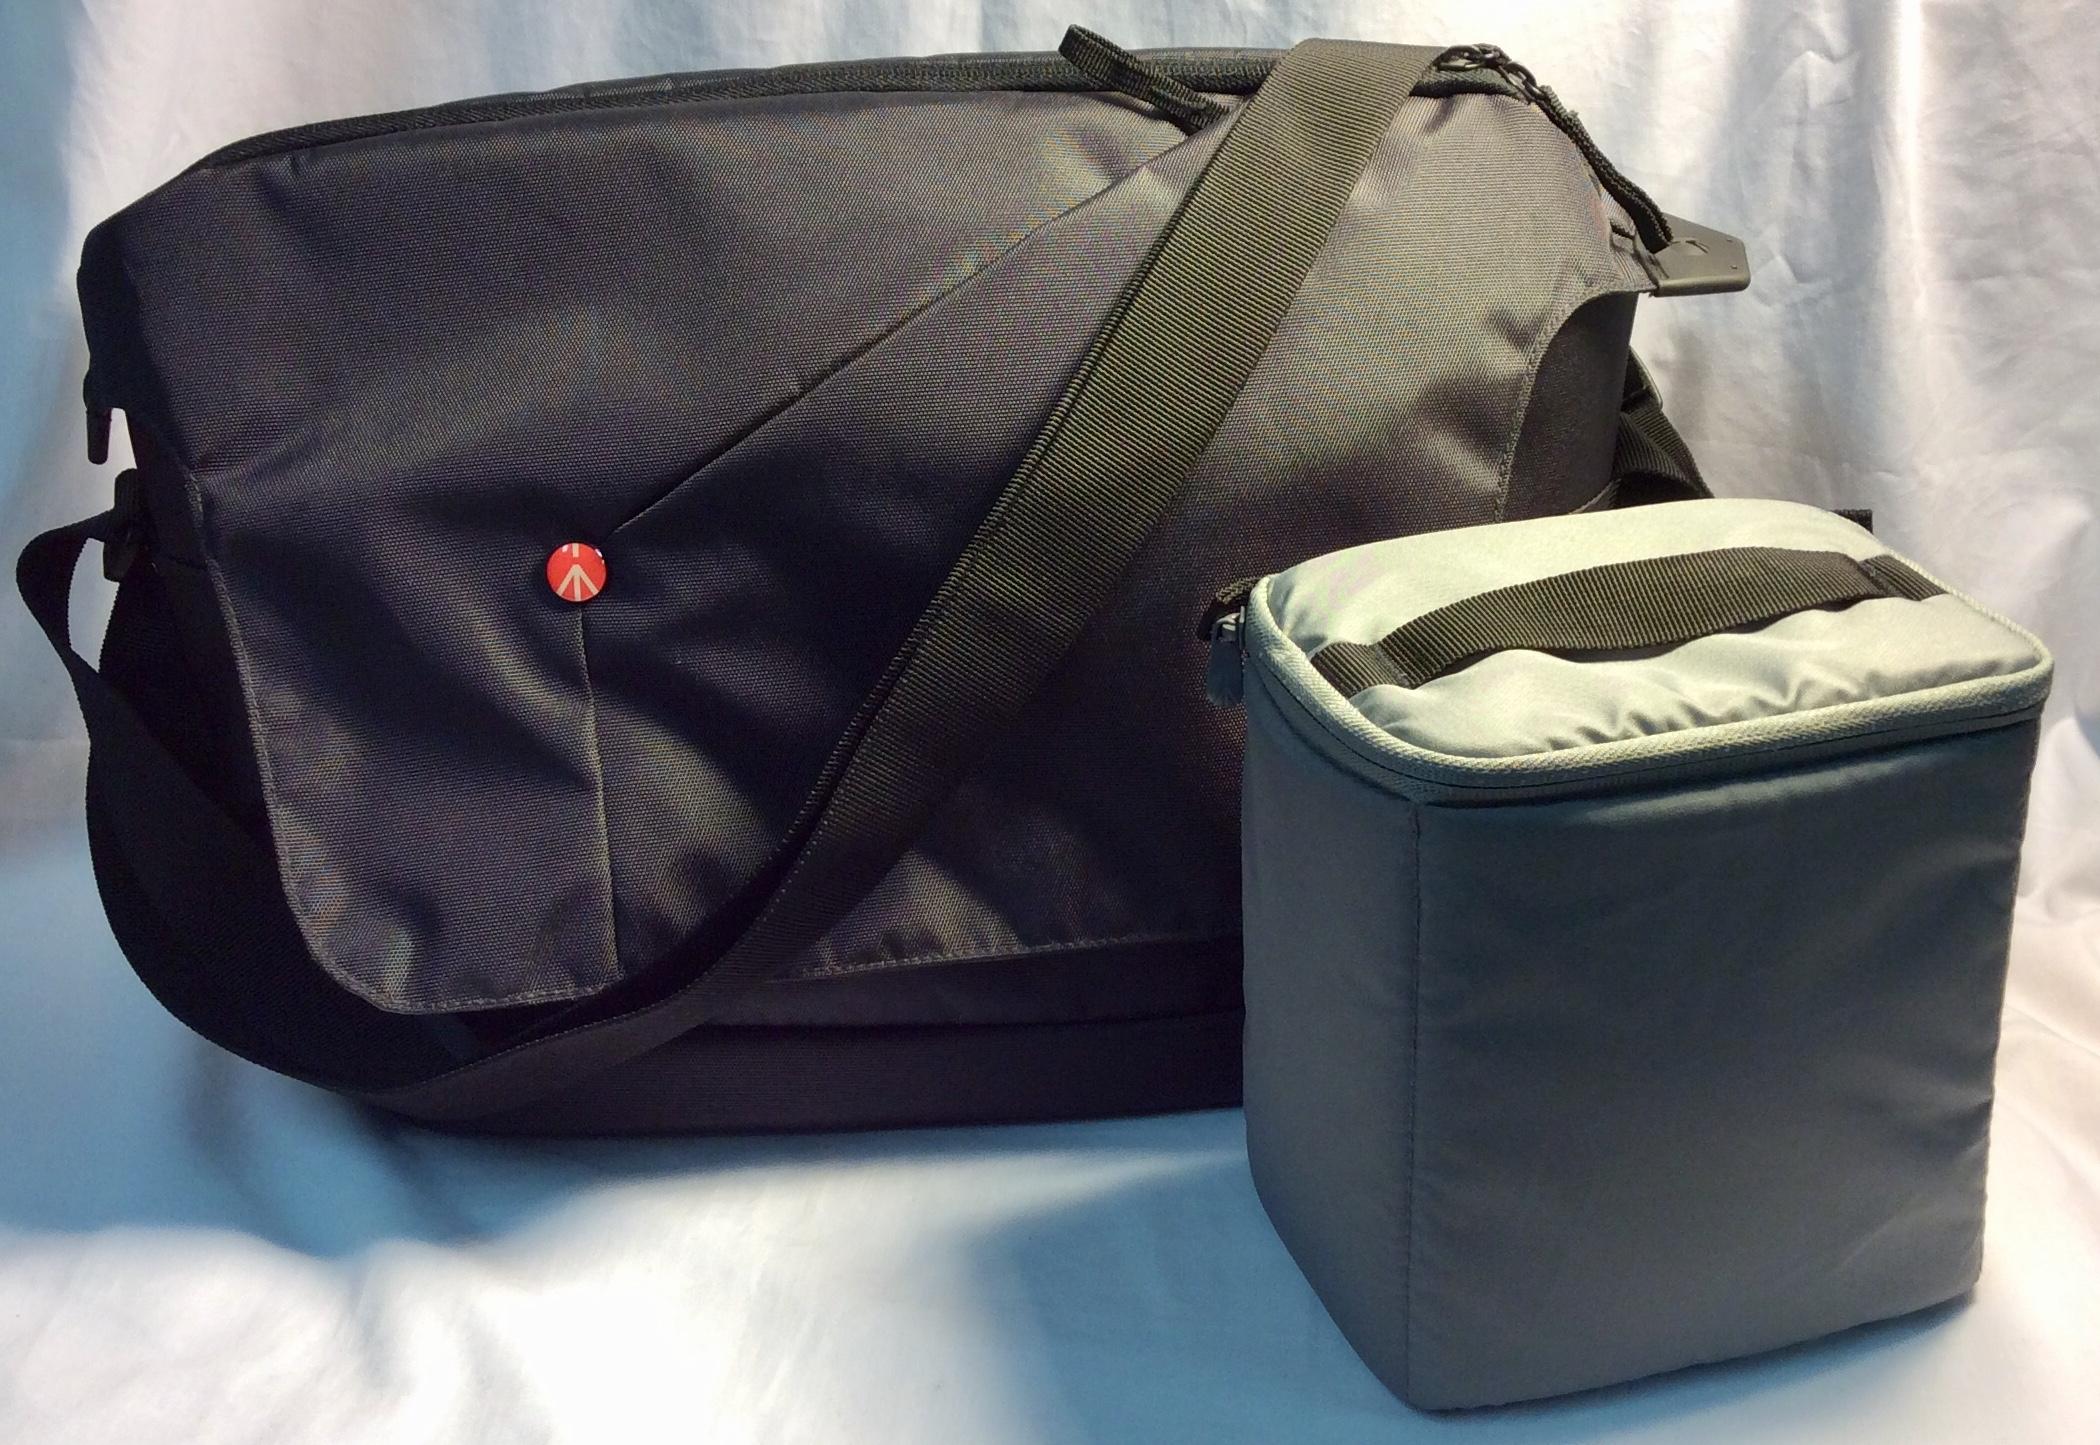 Manfrotto Sturdy grey bag